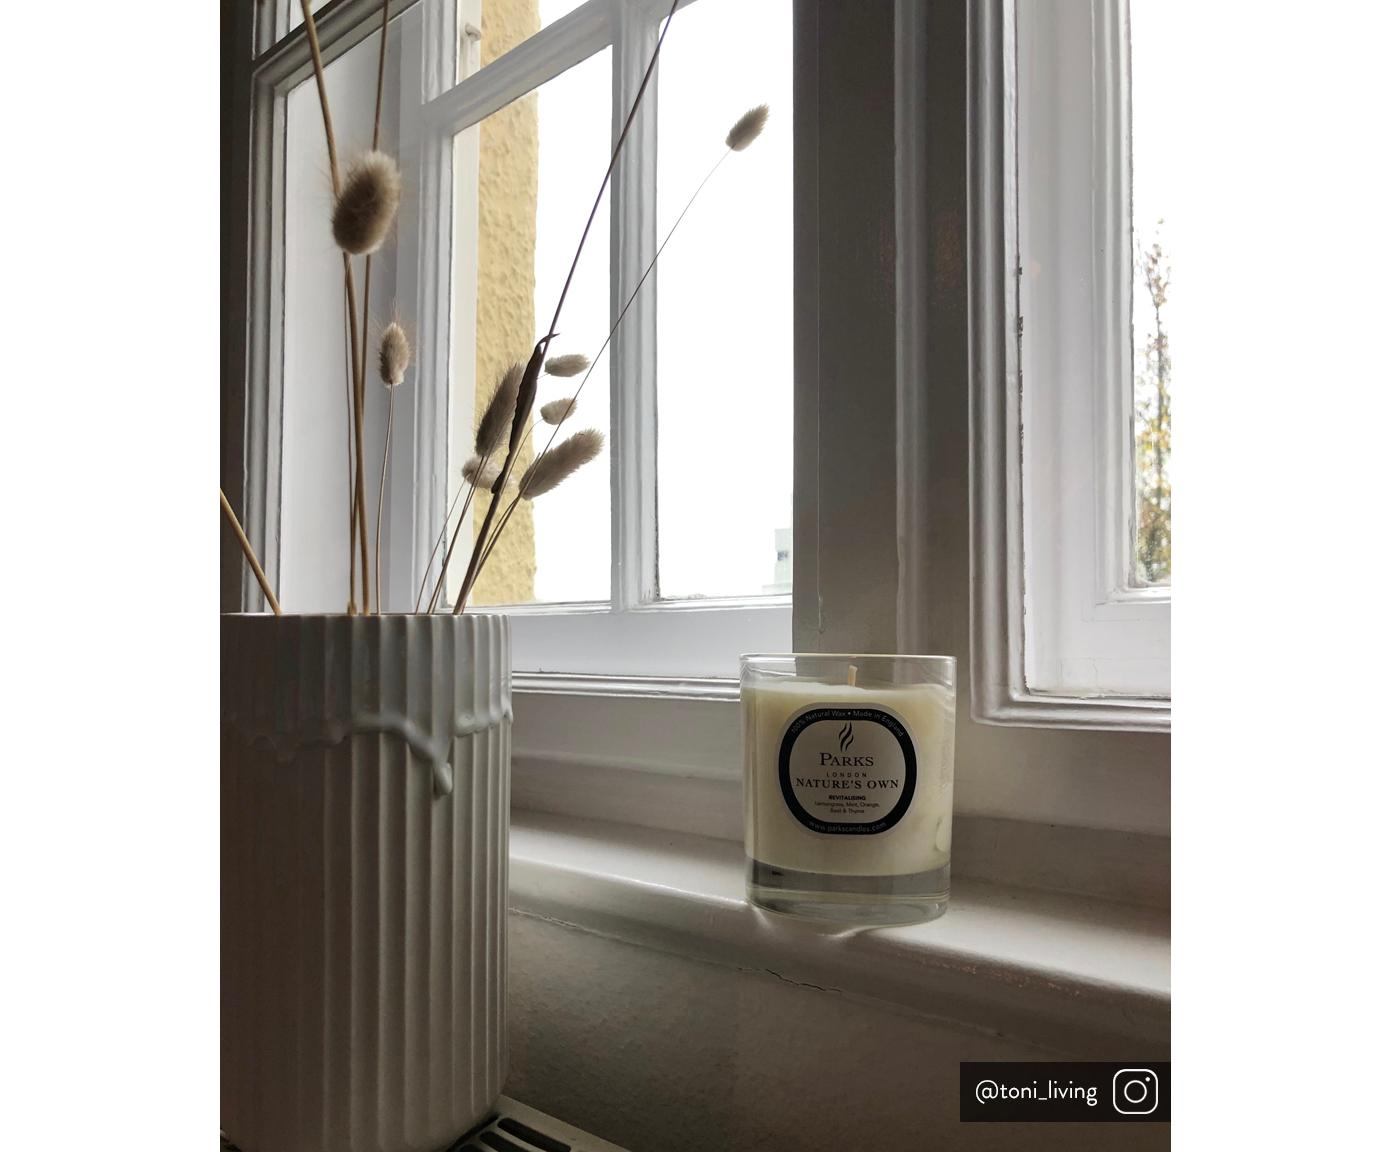 Geurkaars Revitalising Spa (munt, citrus & tijm), Houder: glas, Transparant, wit, Ø 8 x H 9 cm